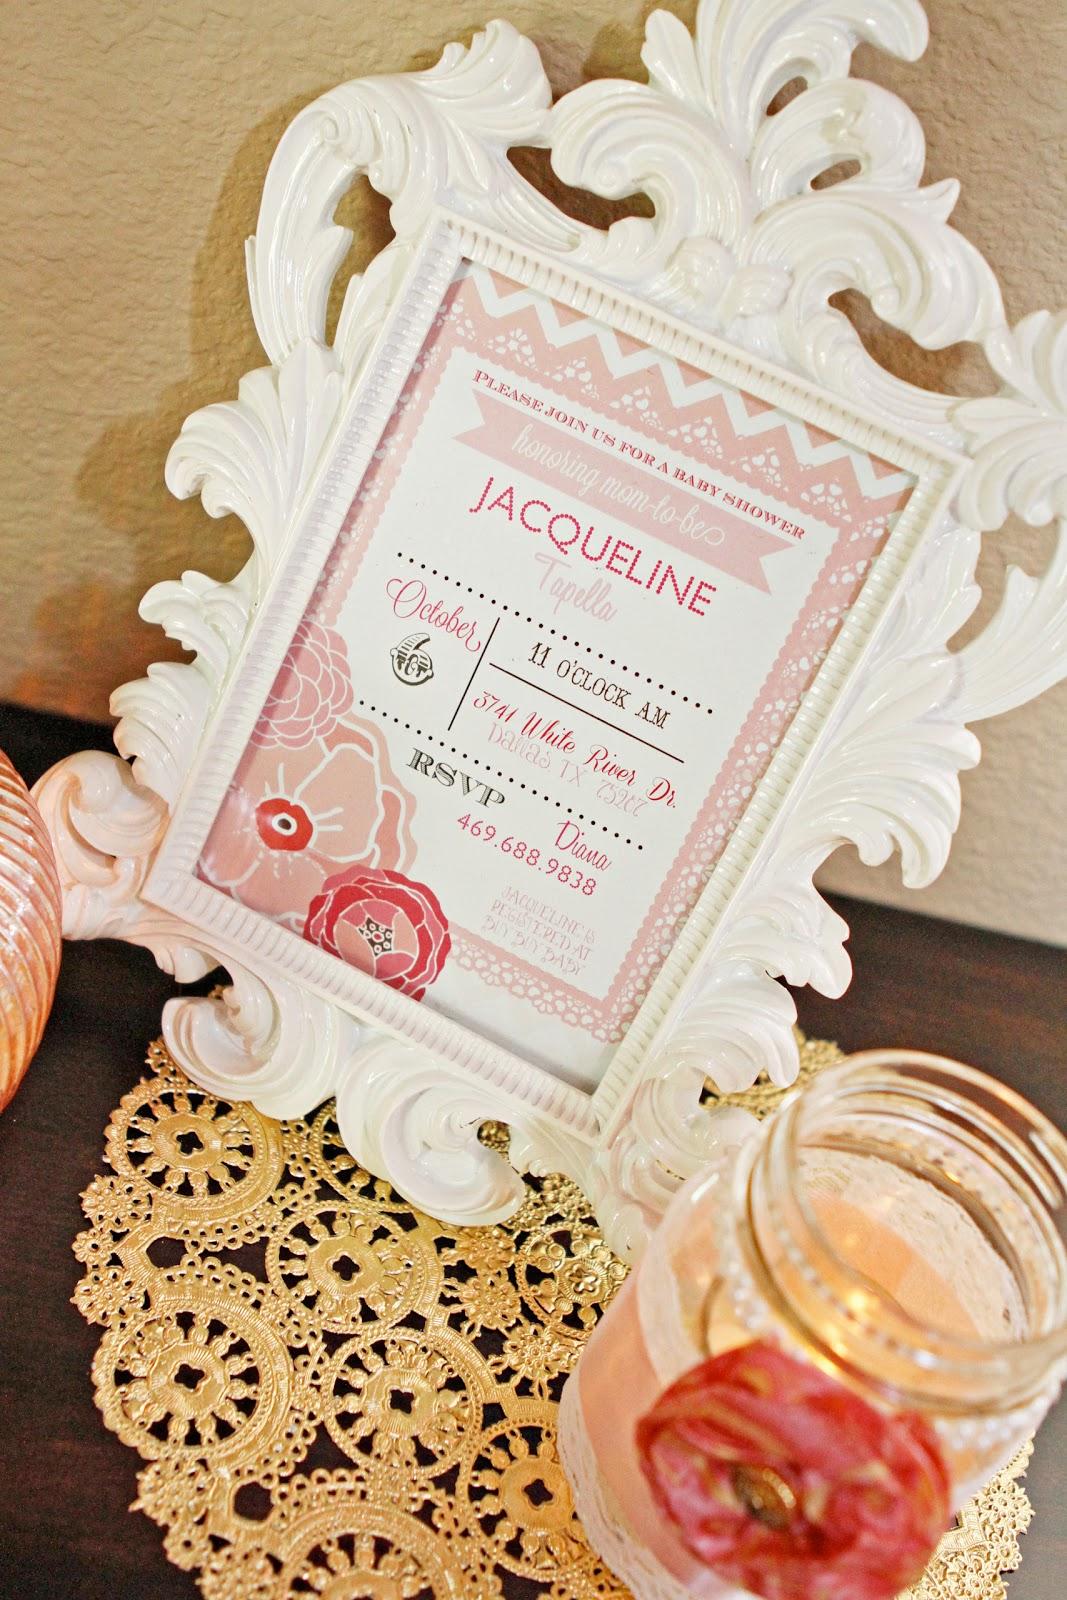 Vintage Baby Shower Decoration Pb J Babes Jacquelines Vintage Tea Party Baby Shower